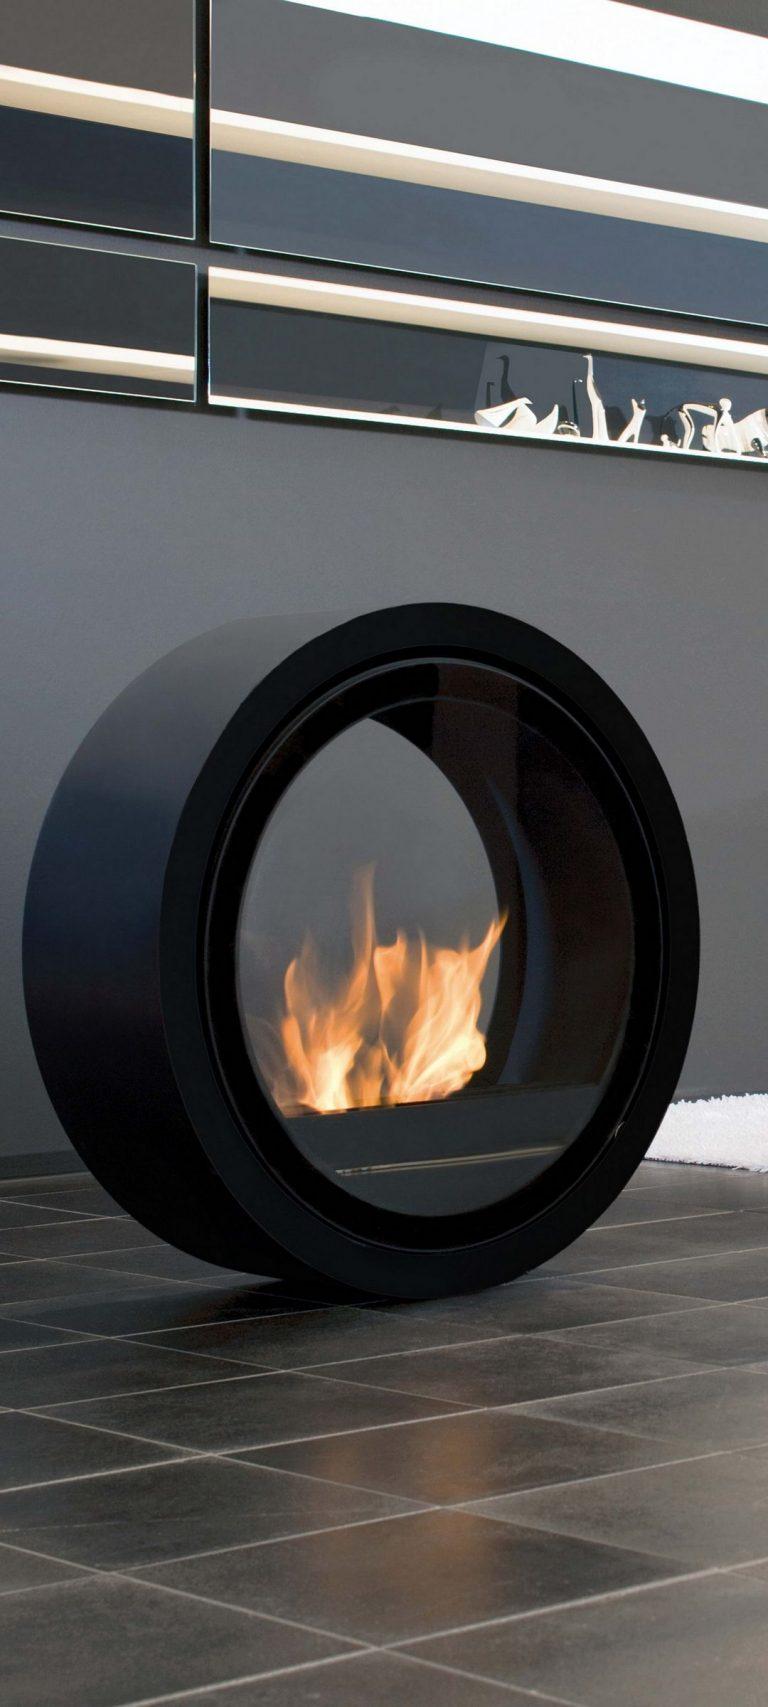 Fireplace Unusual Creative 1080x2400 768x1707